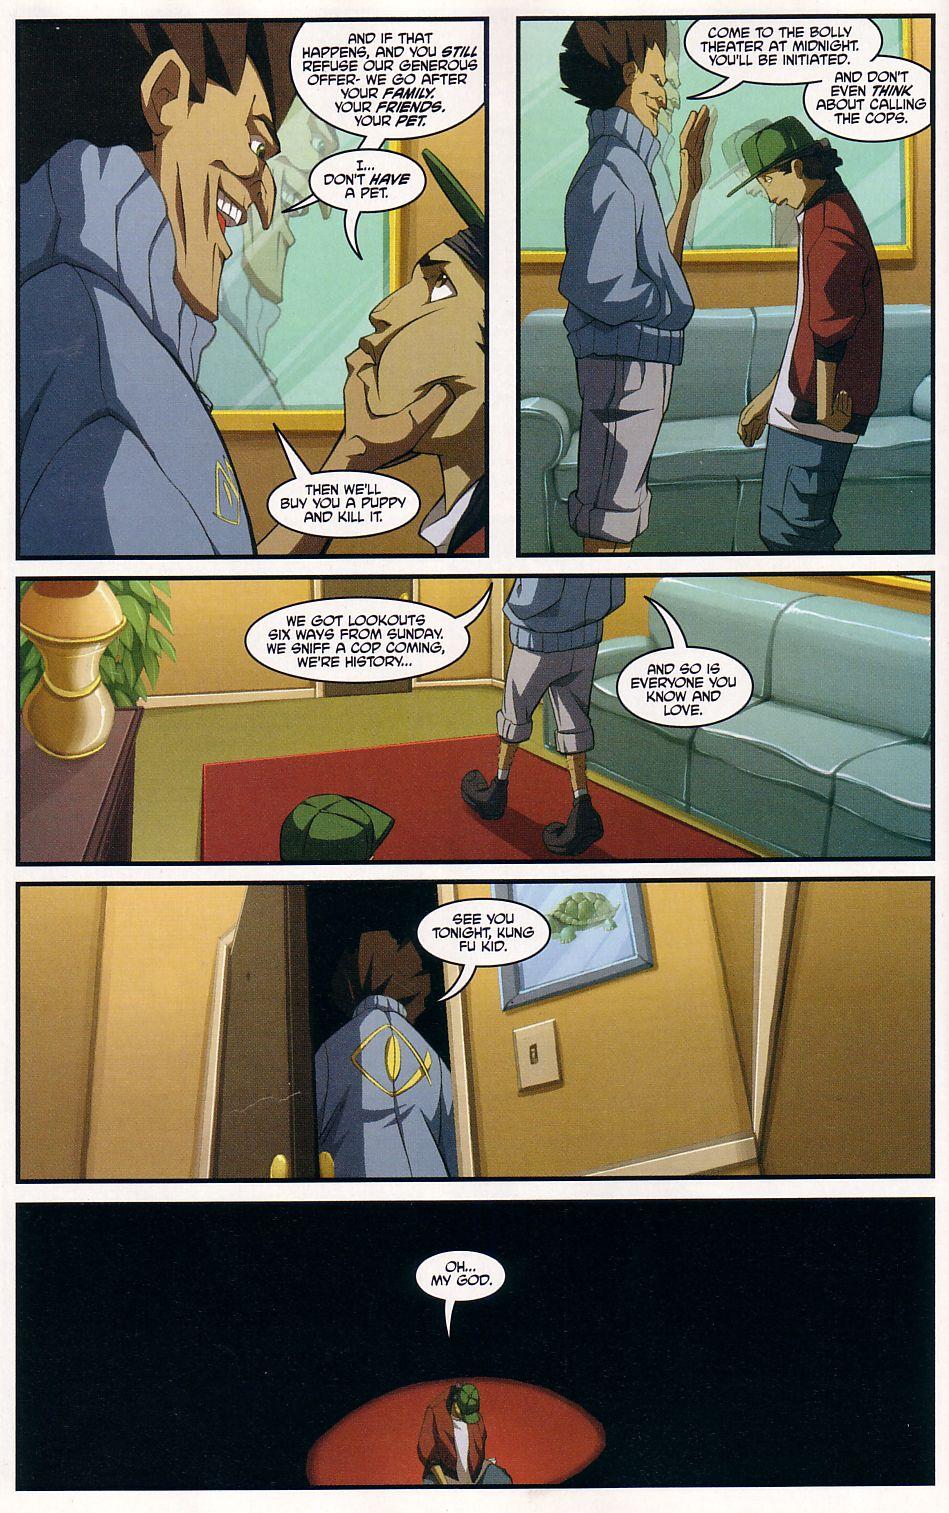 Teenage Mutant Ninja Turtles (2003) chap 7 pic 14